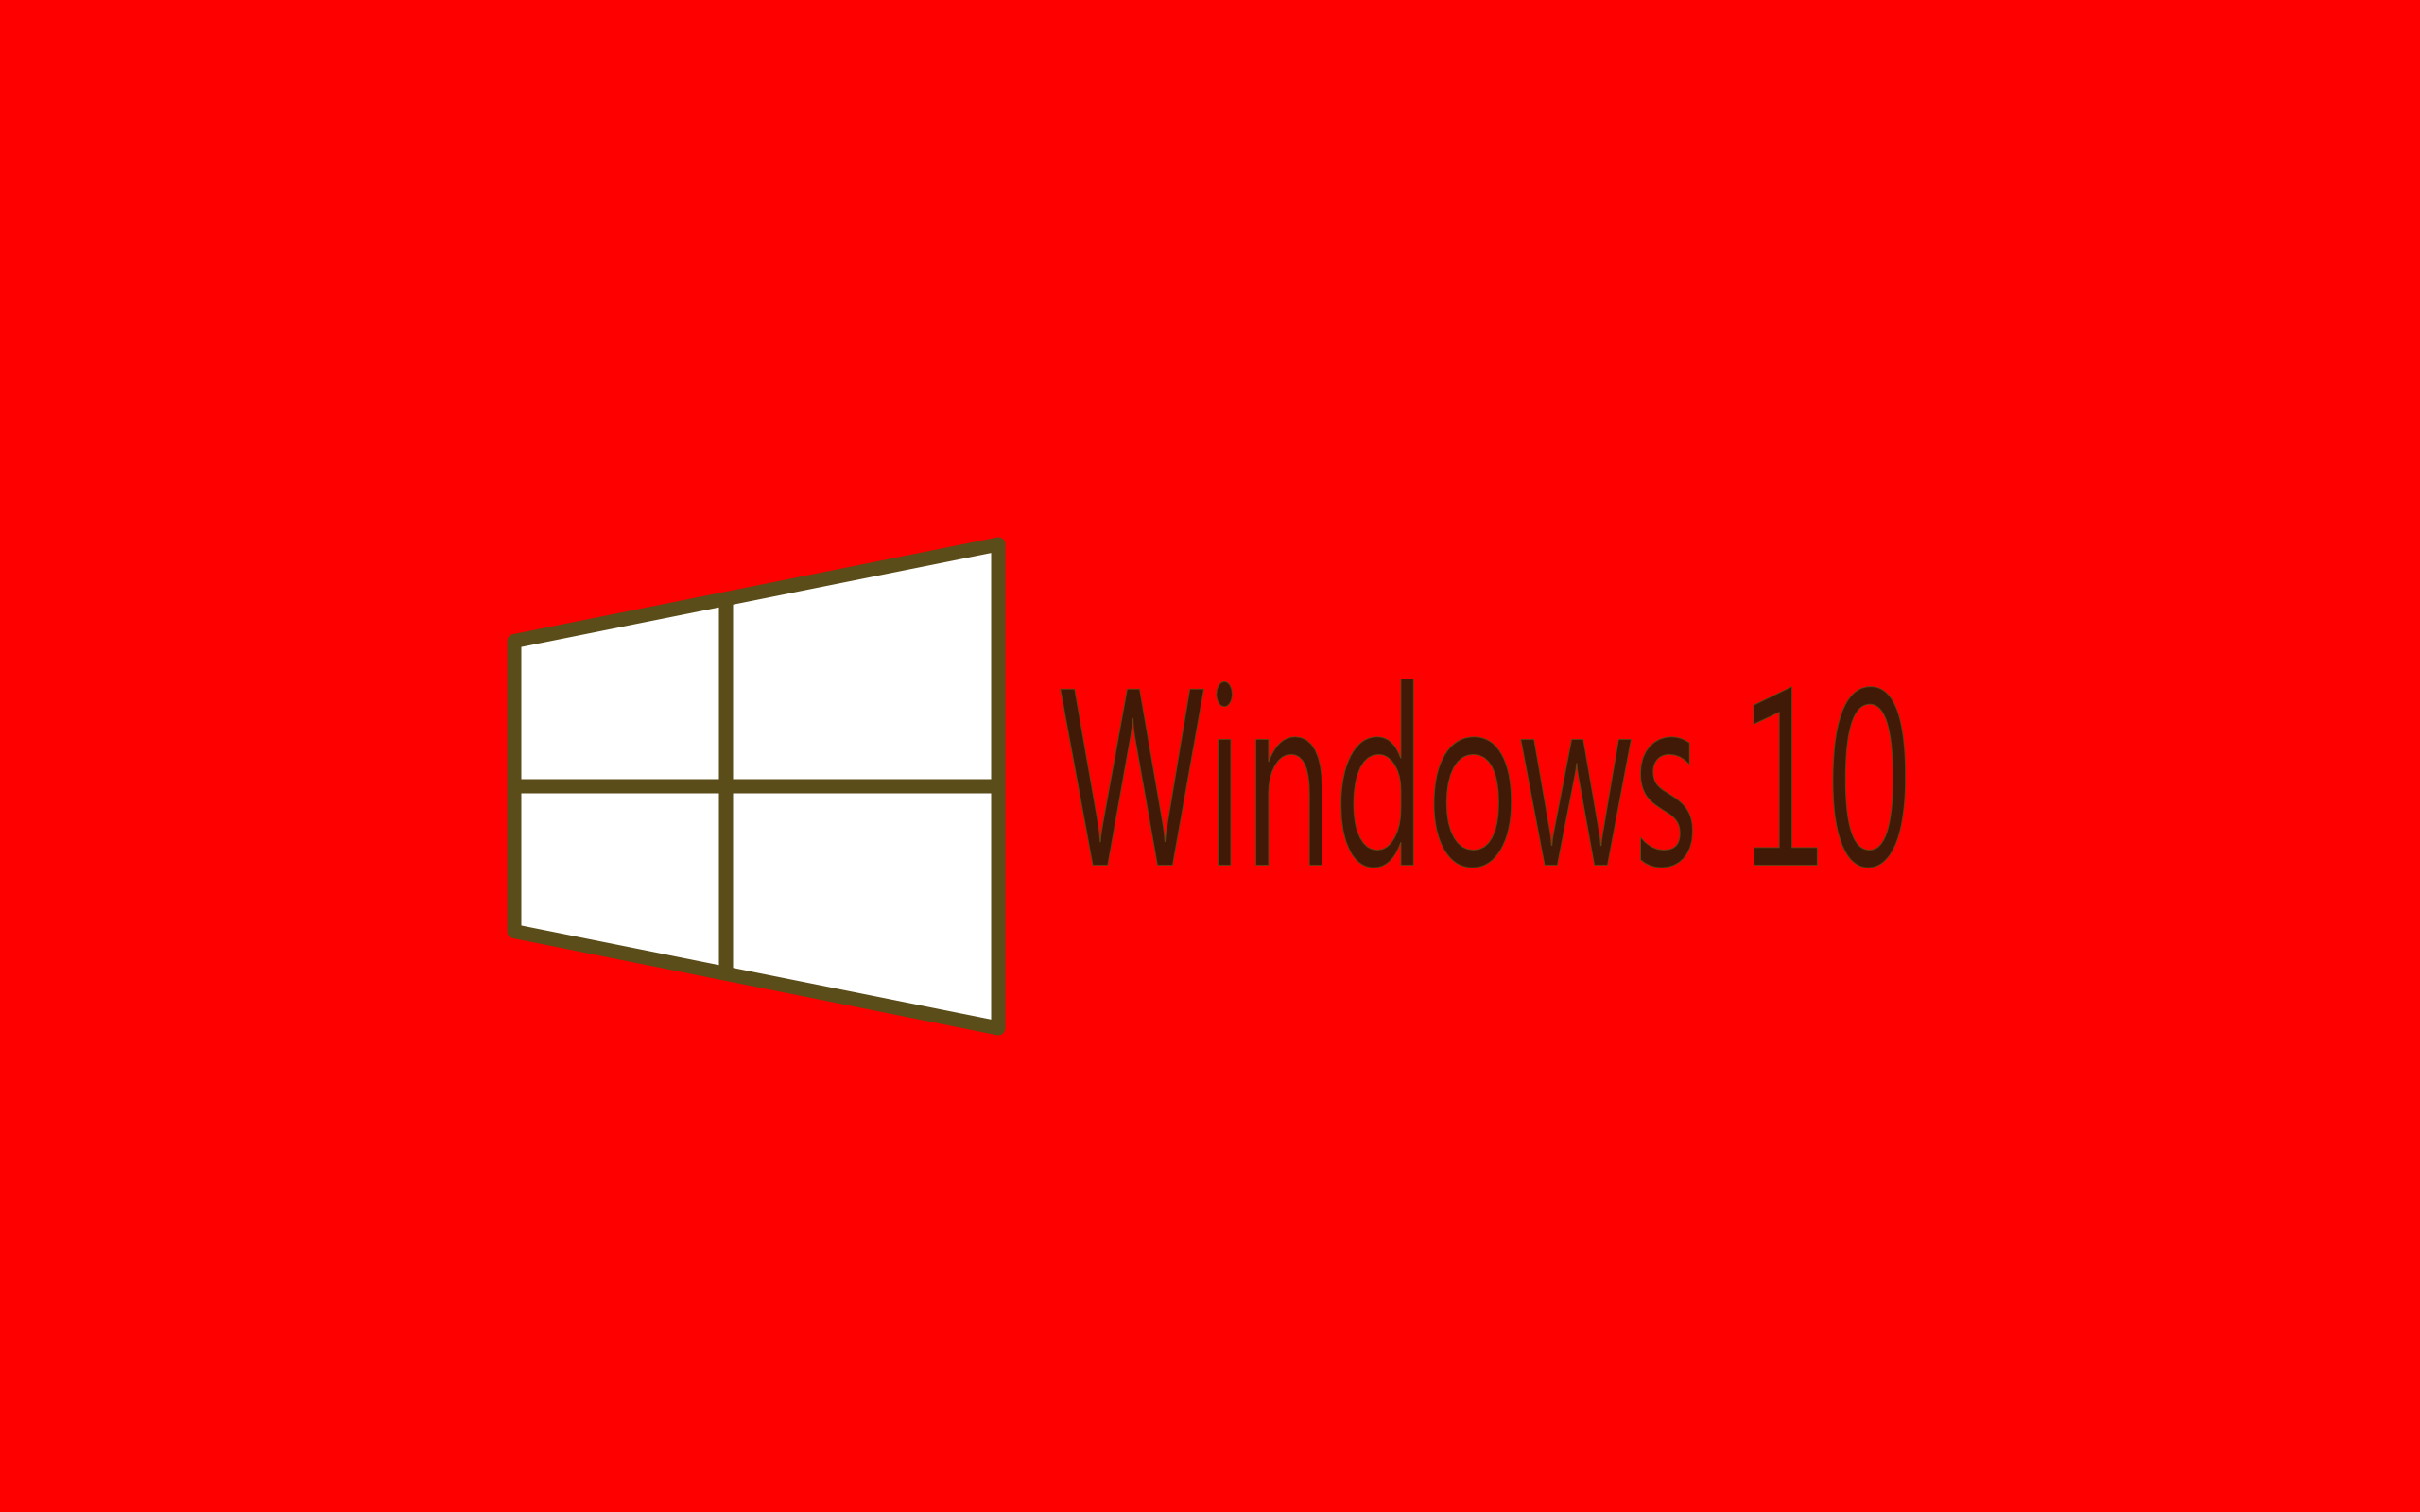 Windows10 Red Papel De Parede HD